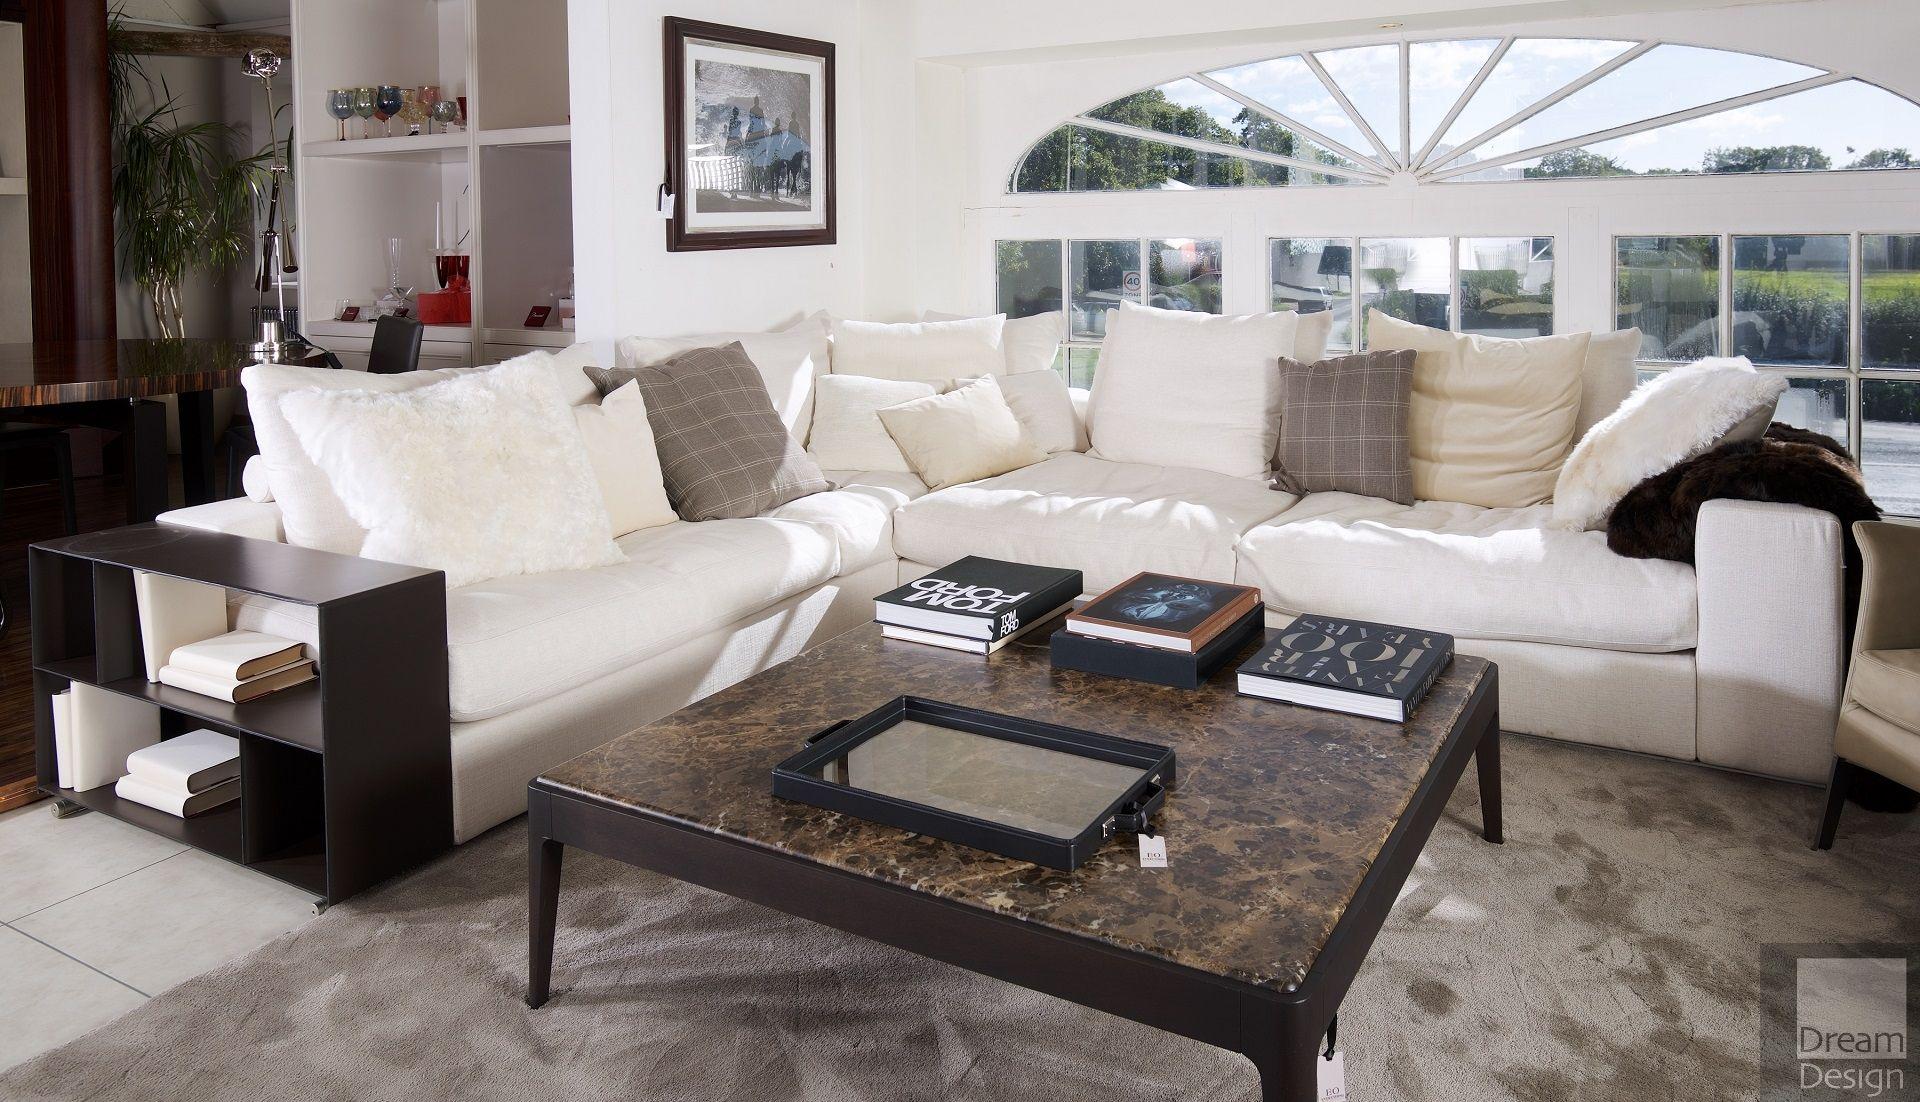 Flexform groundpiece ex display sofa everything but ordinary for Flexform groundpiece